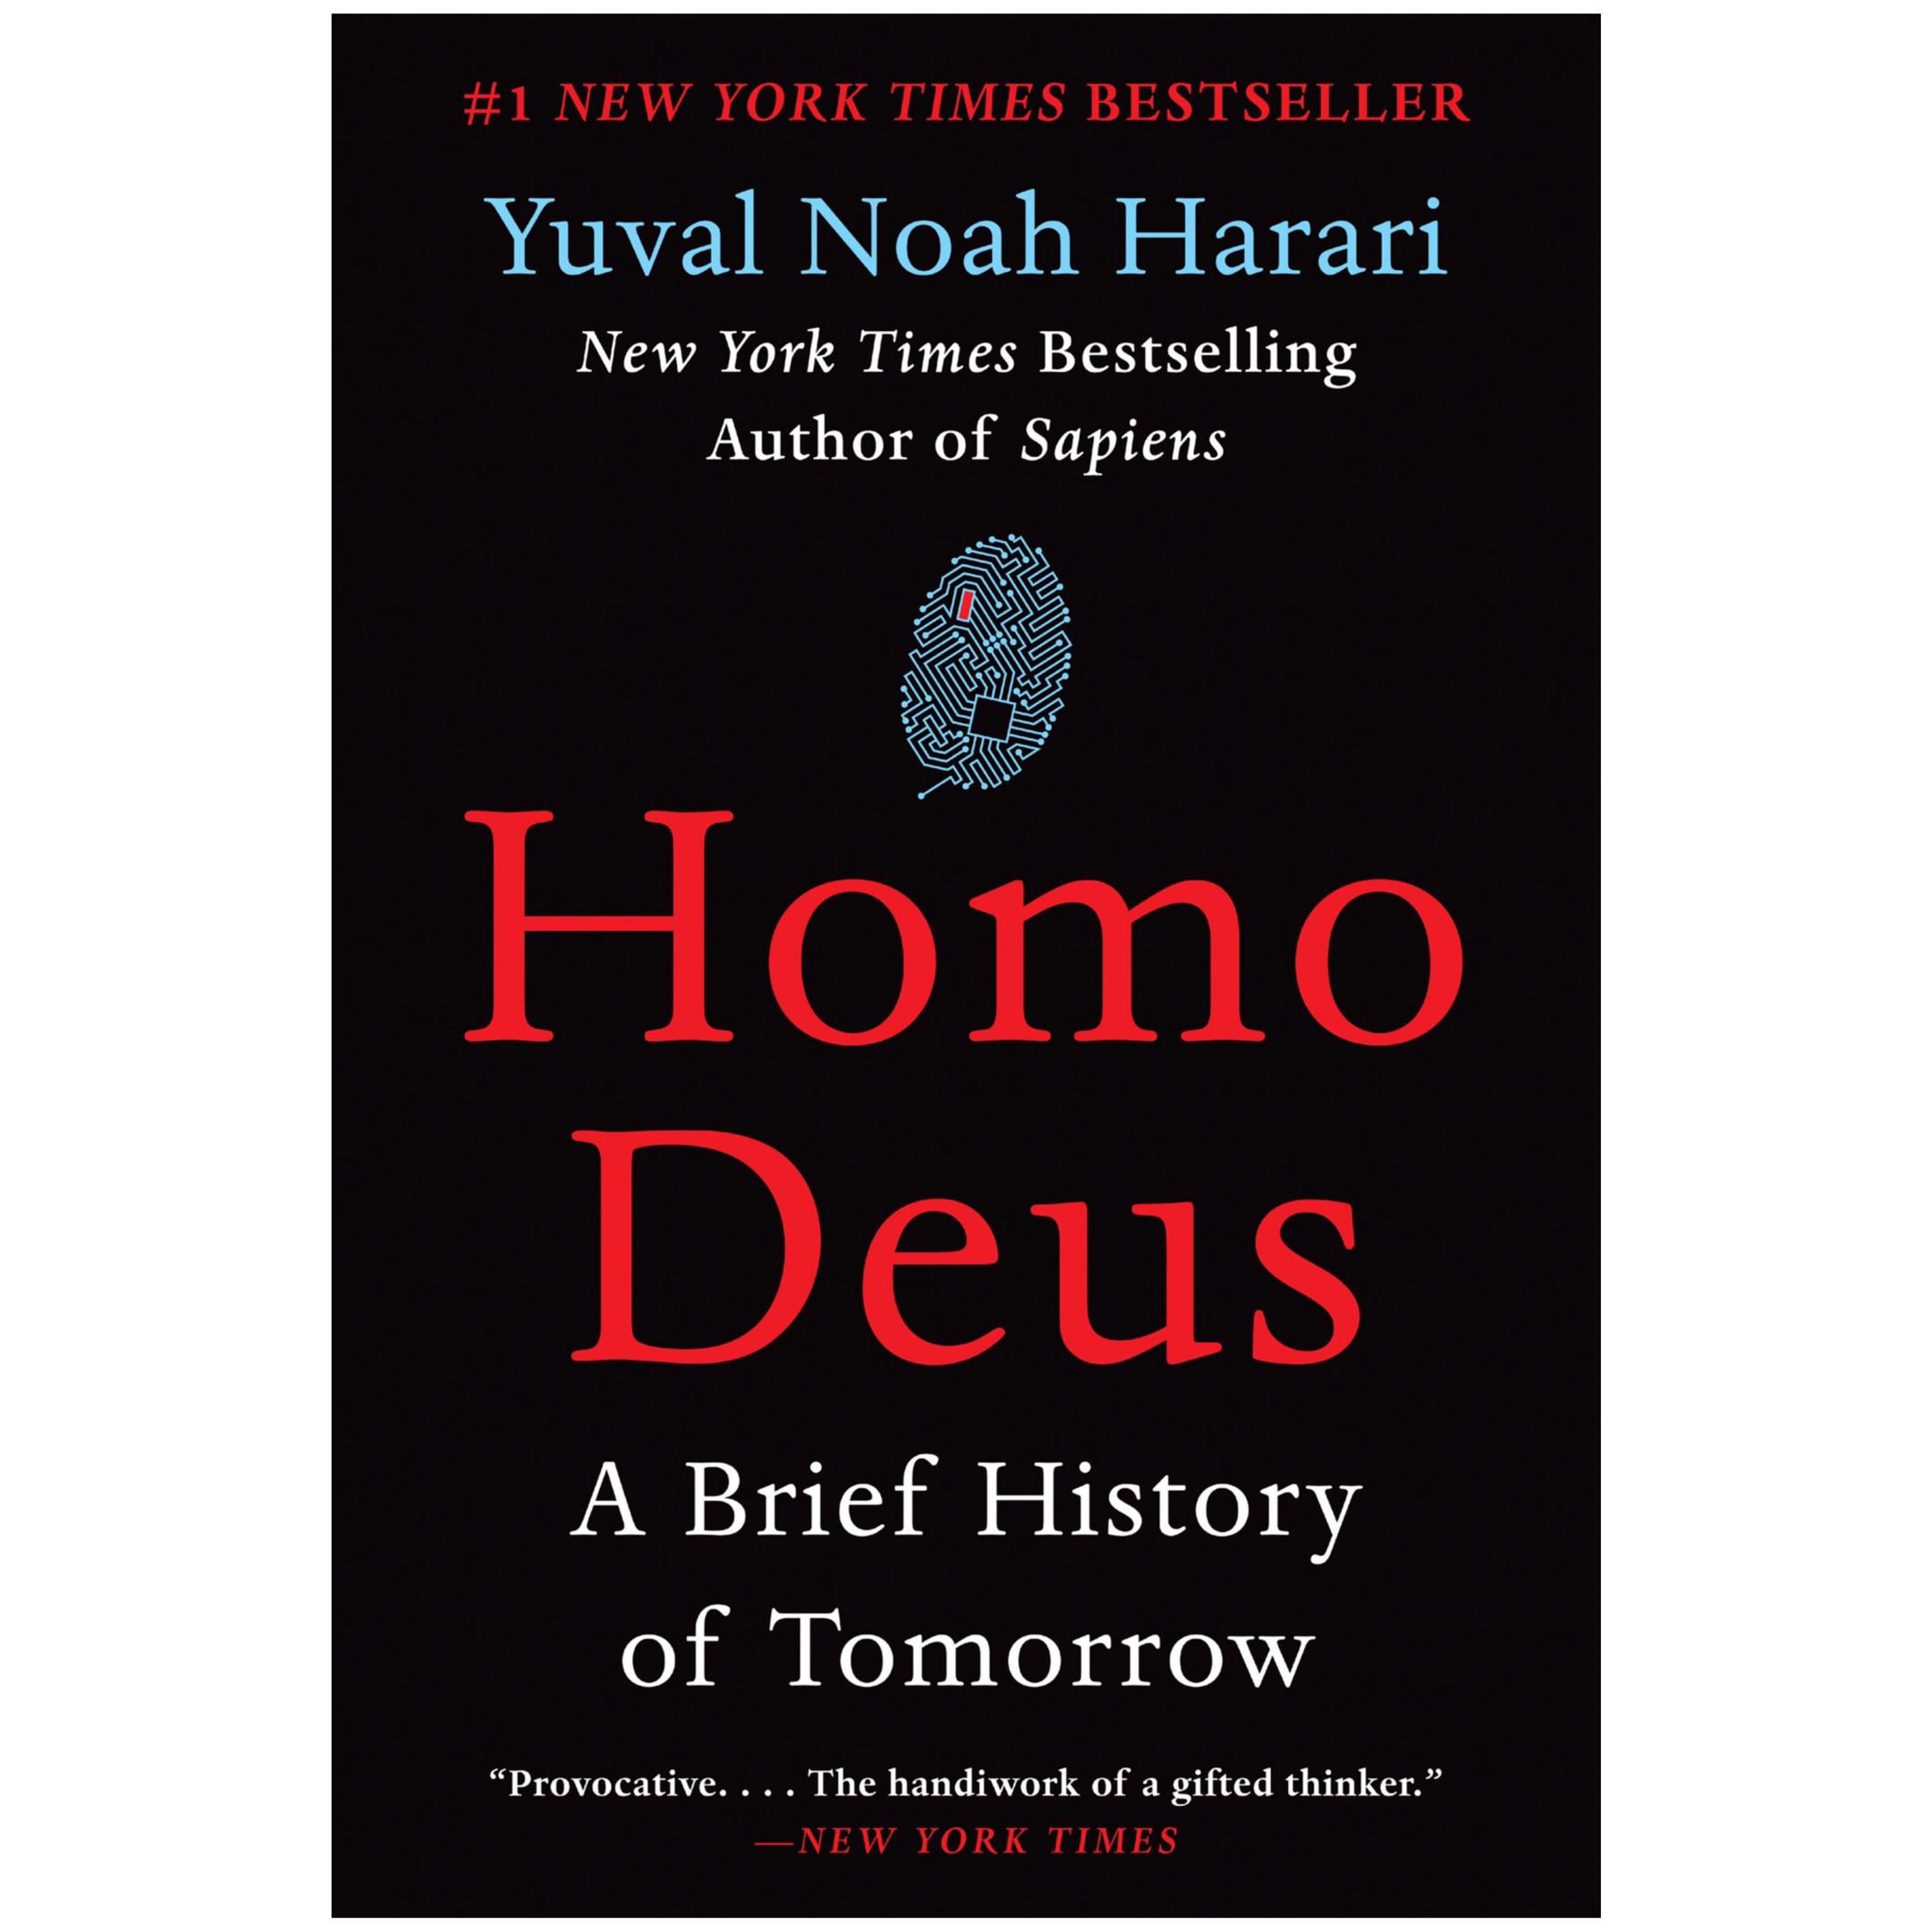 Homo Deus: A Brief History of Tomorrow by Yuval Harari   Cedar + Surf Must Read List